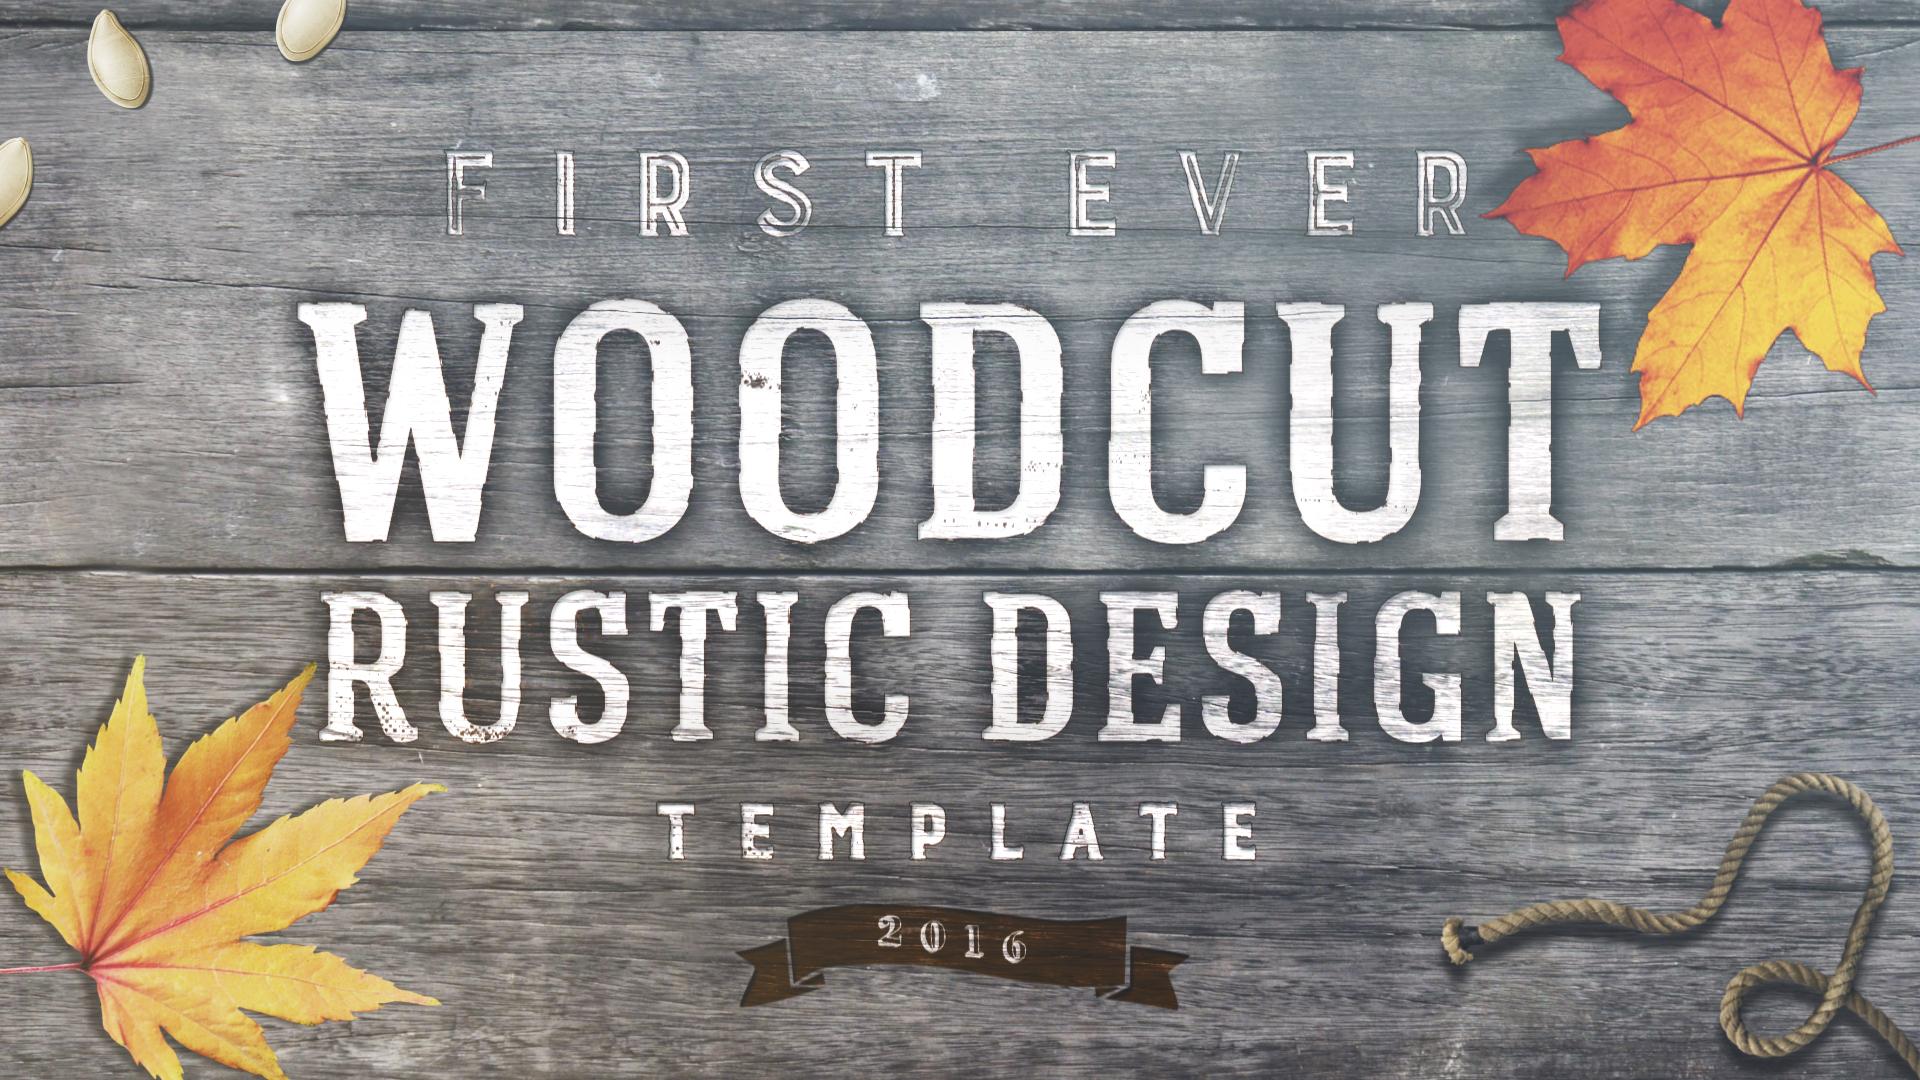 Woodcut_Rustic_Slideshow_1080p_00816